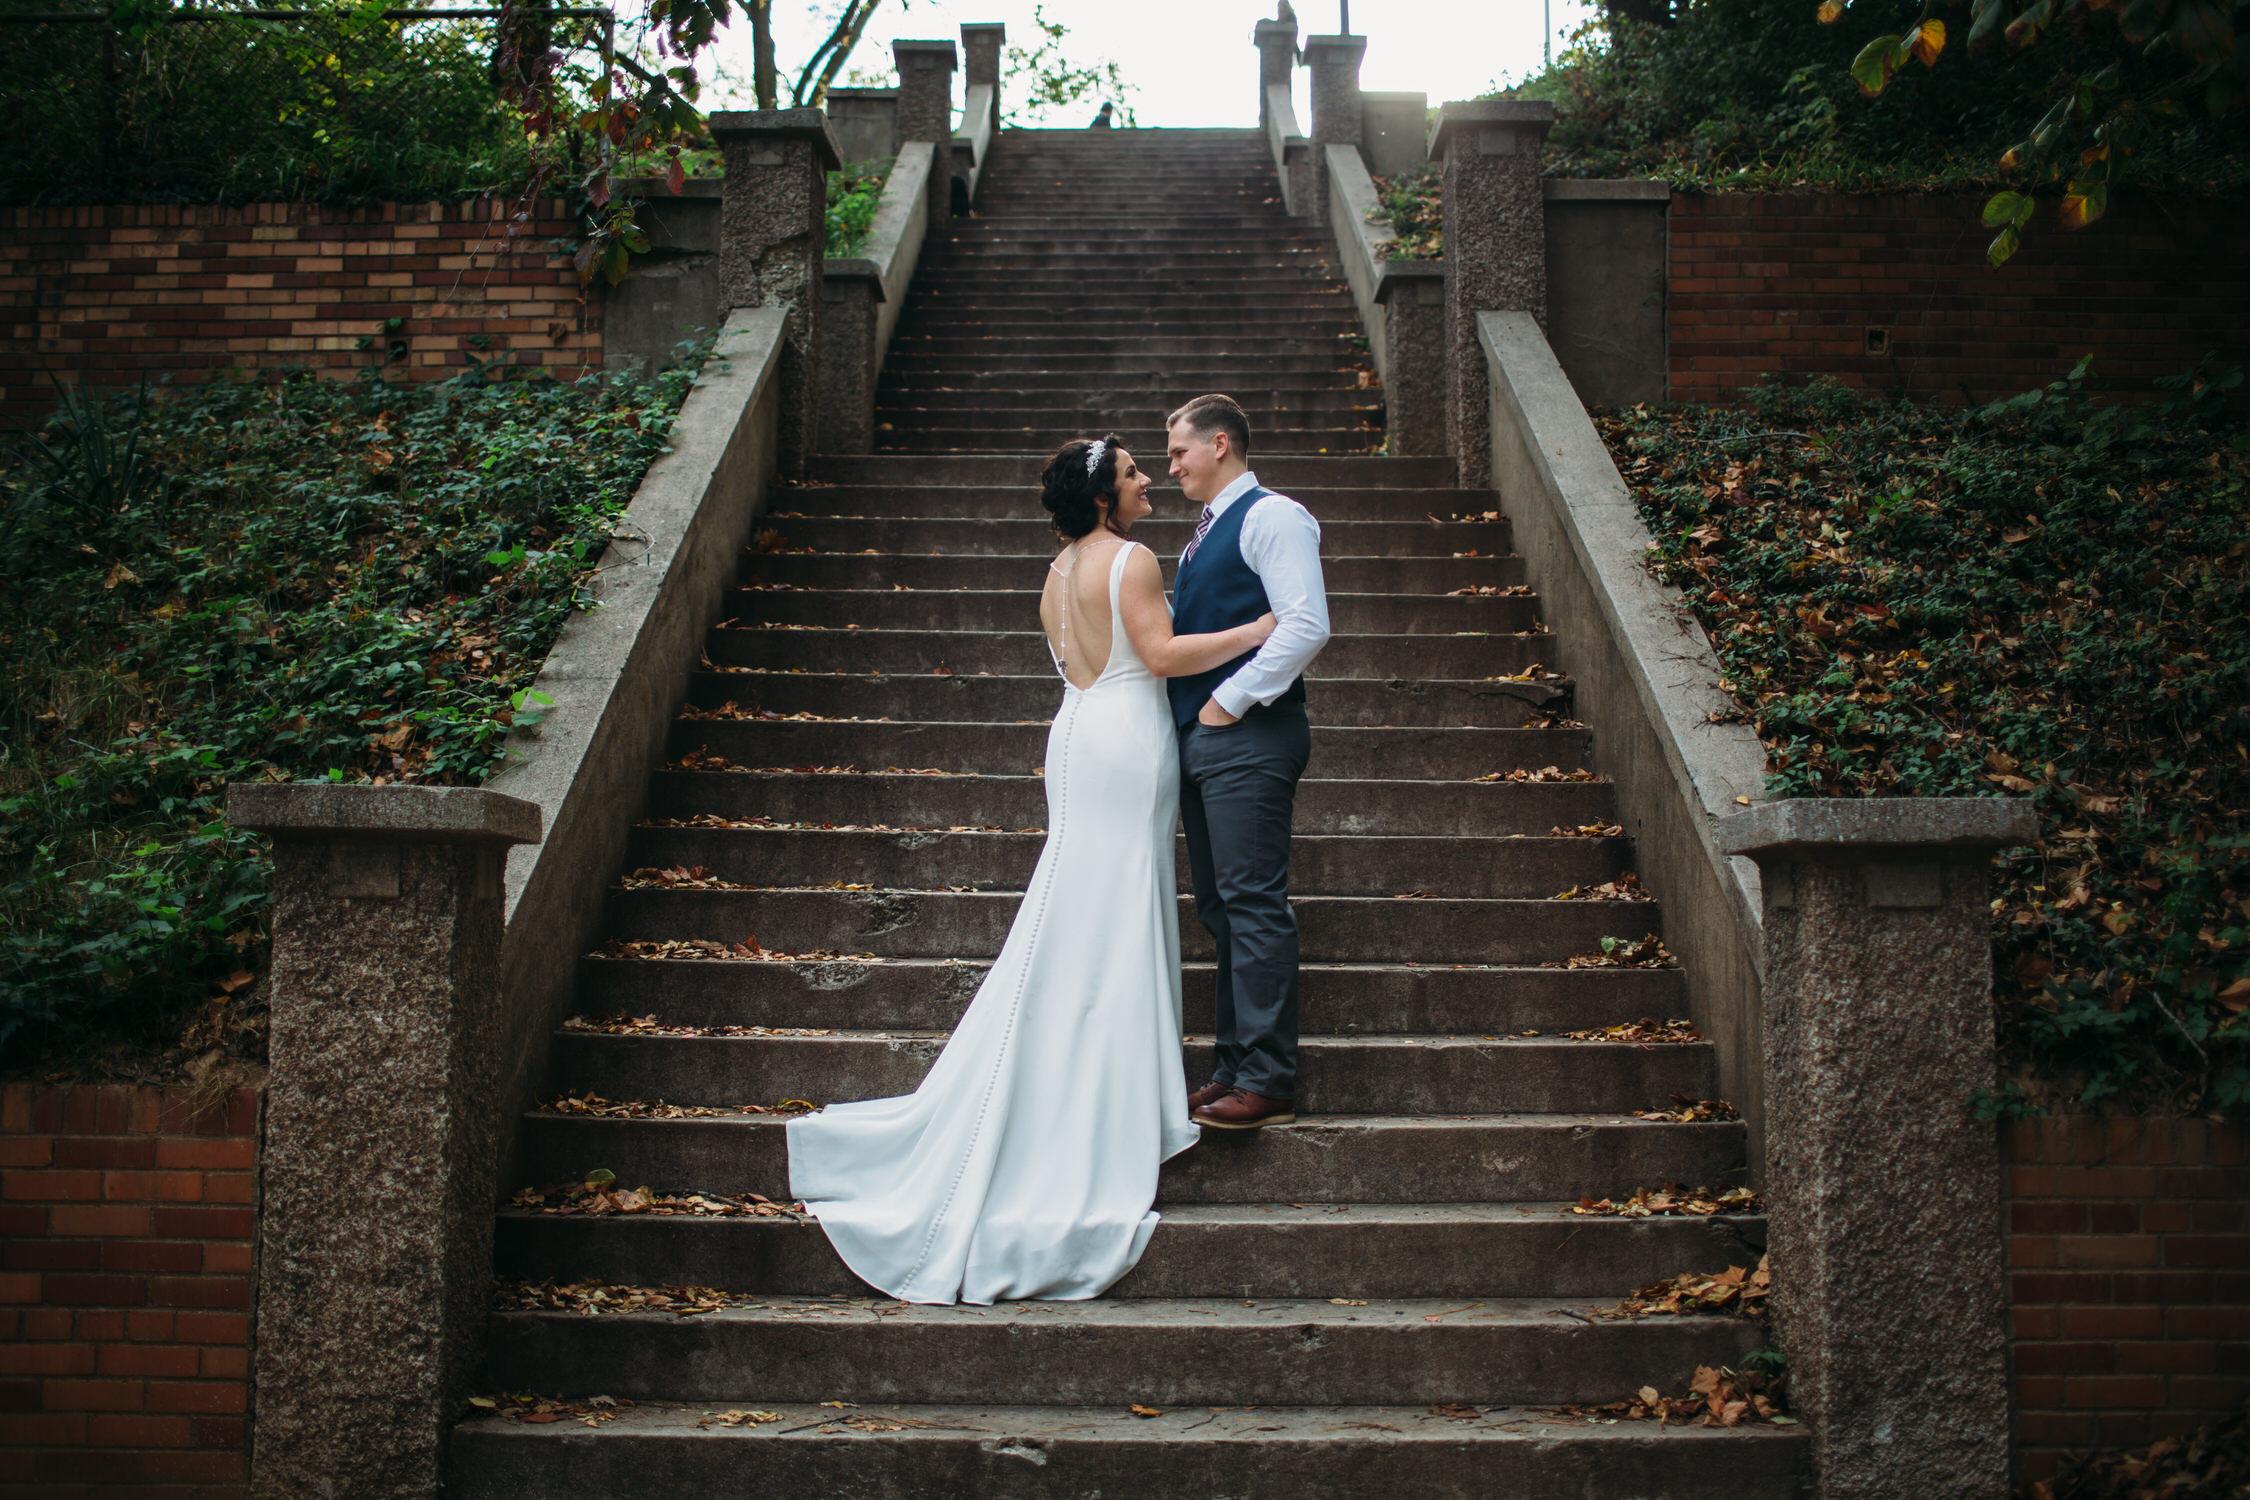 Destination wedding photographer, seattle wedding